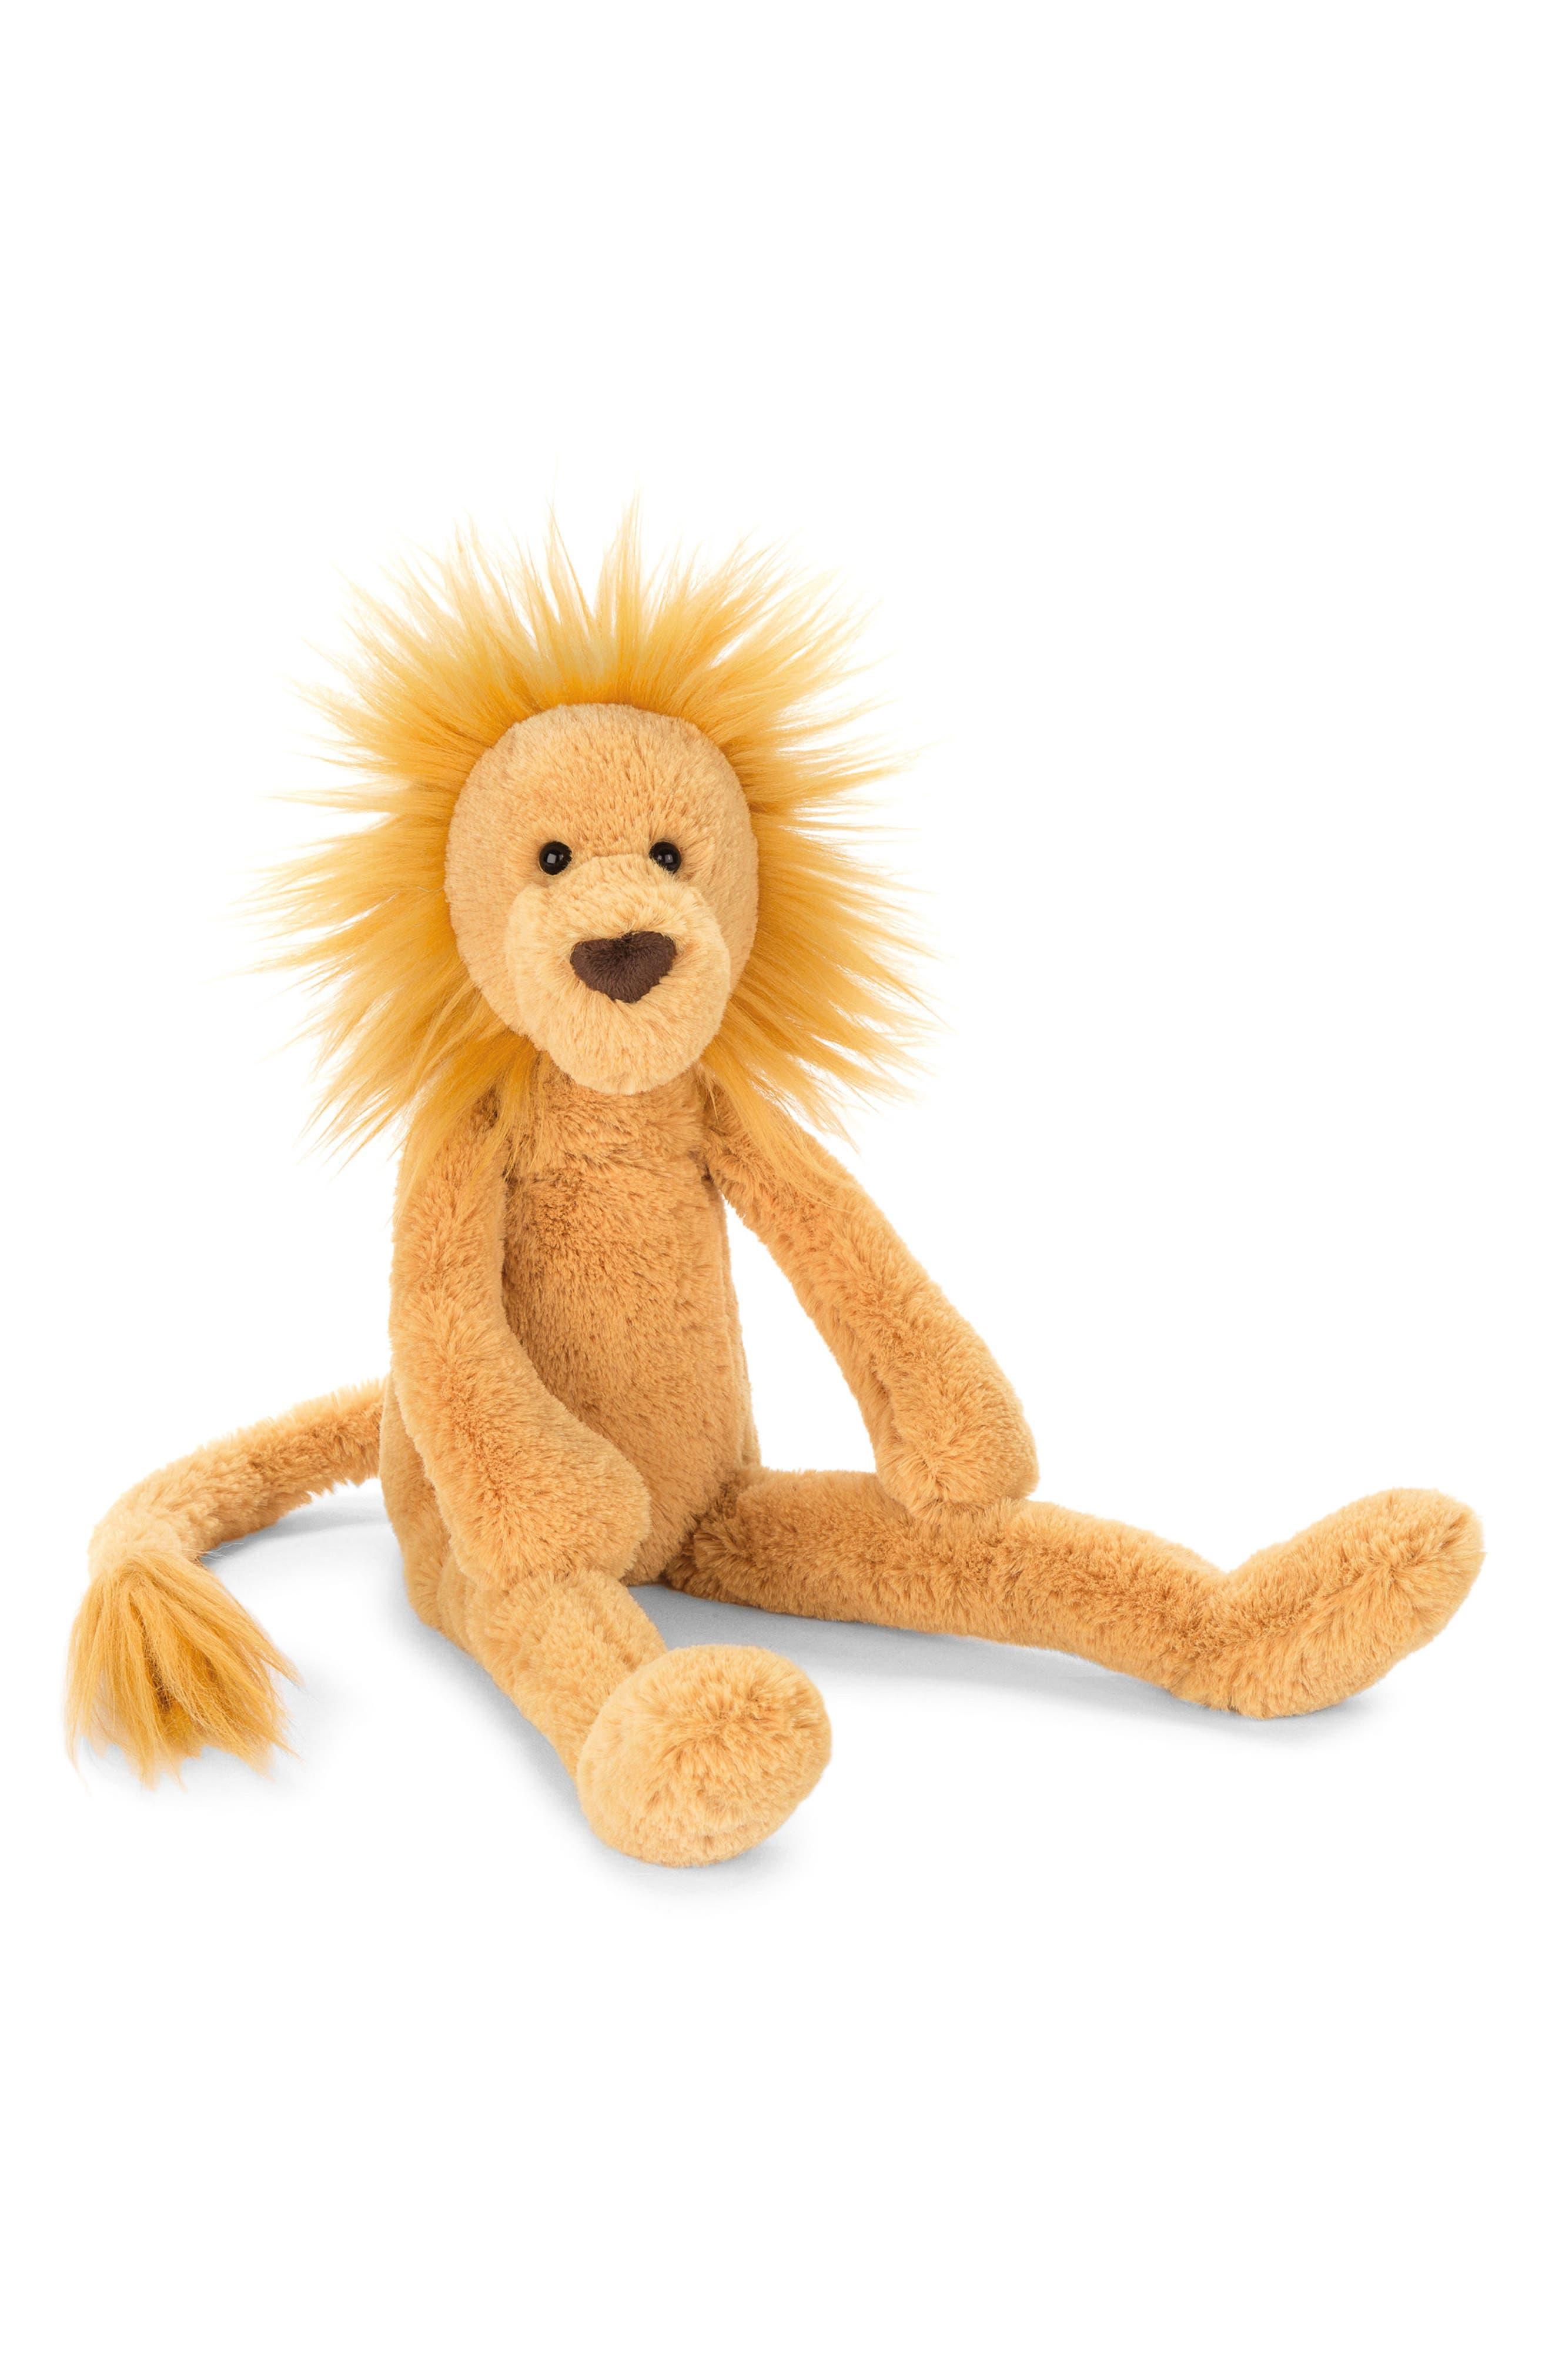 Pitterpat Lion Stuffed Animal,                             Main thumbnail 1, color,                             Yellow